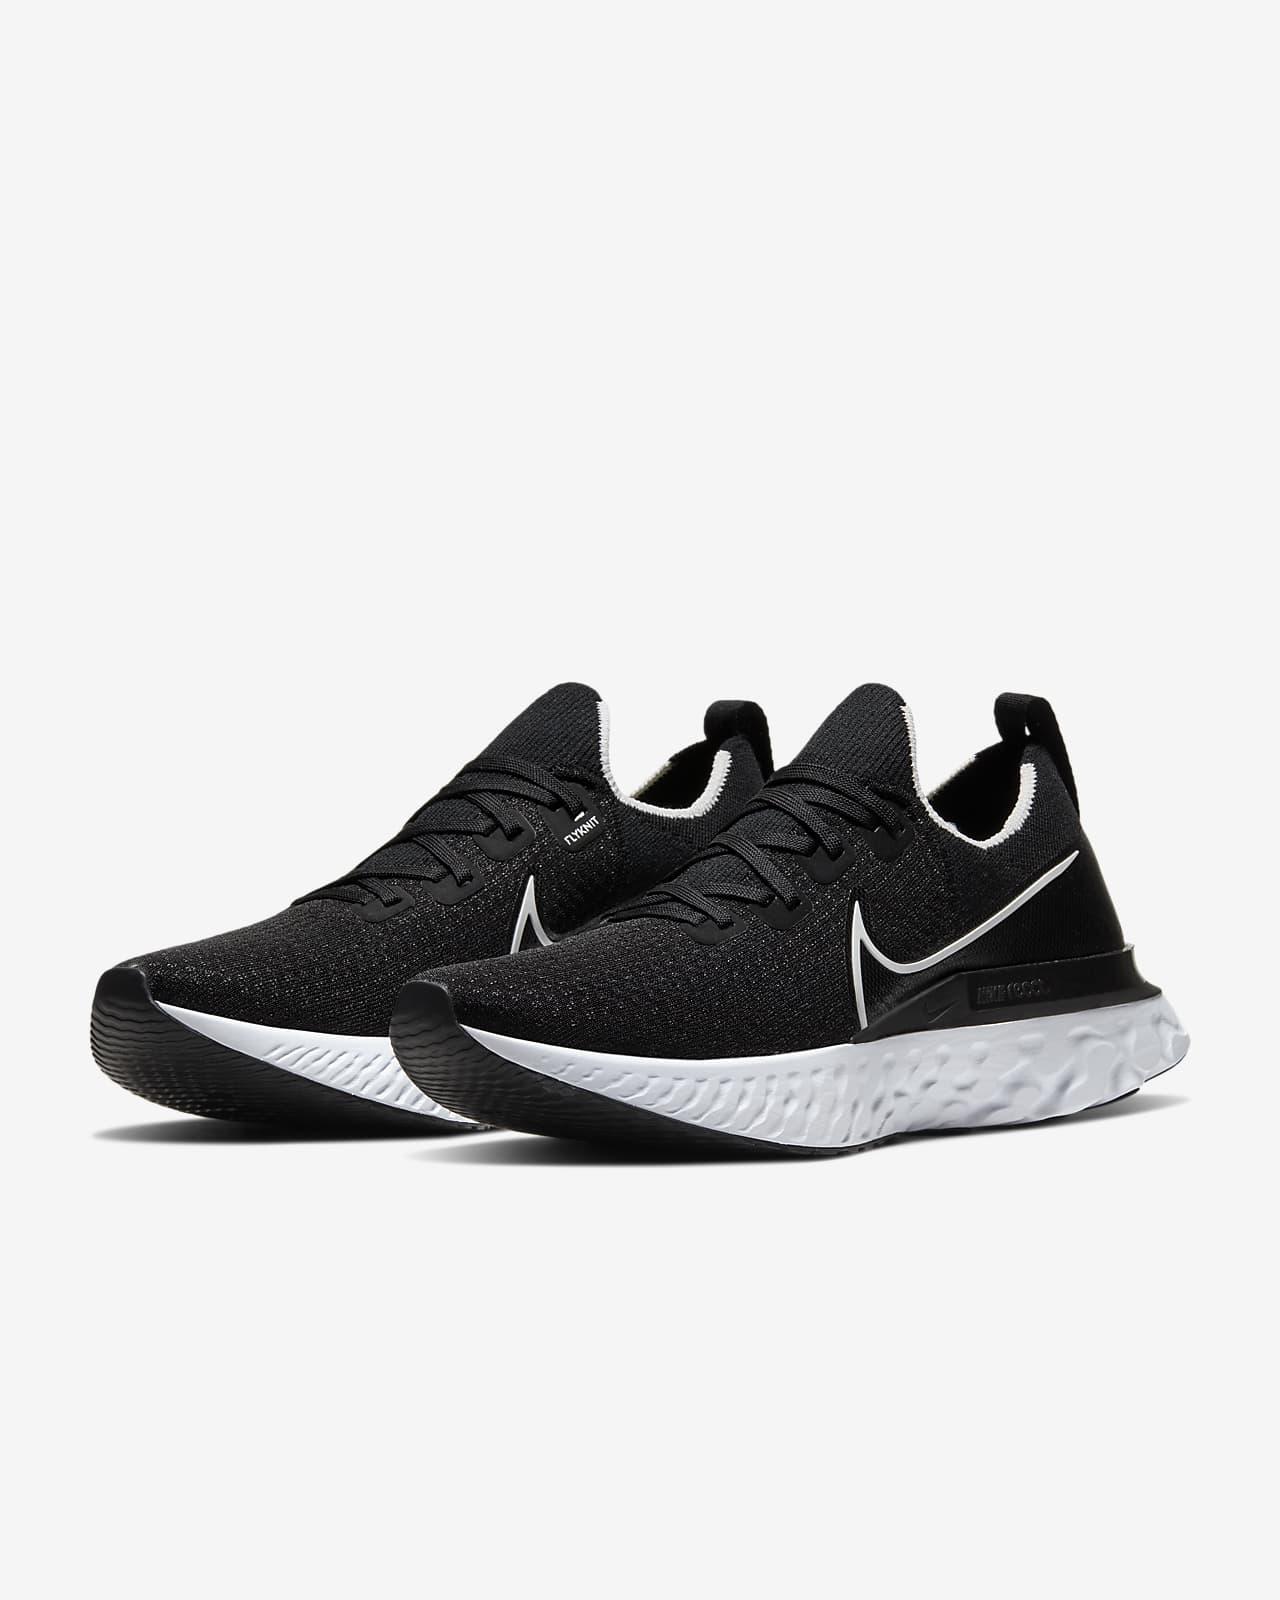 Nike React Infinity Run Flyknit Men's